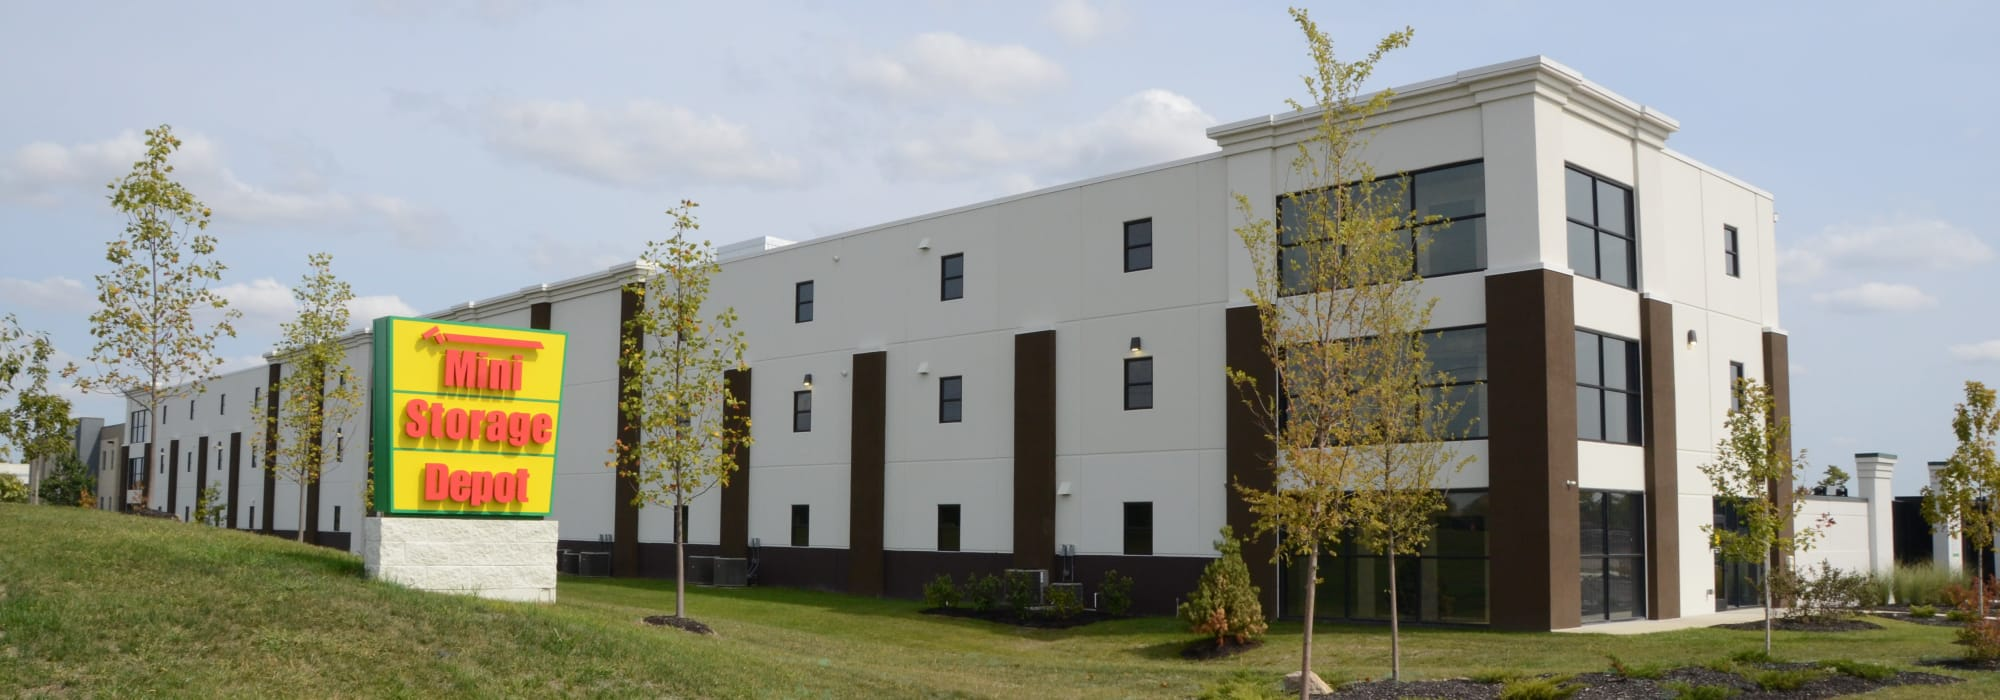 Mini Storage Depot in Mason, Ohio